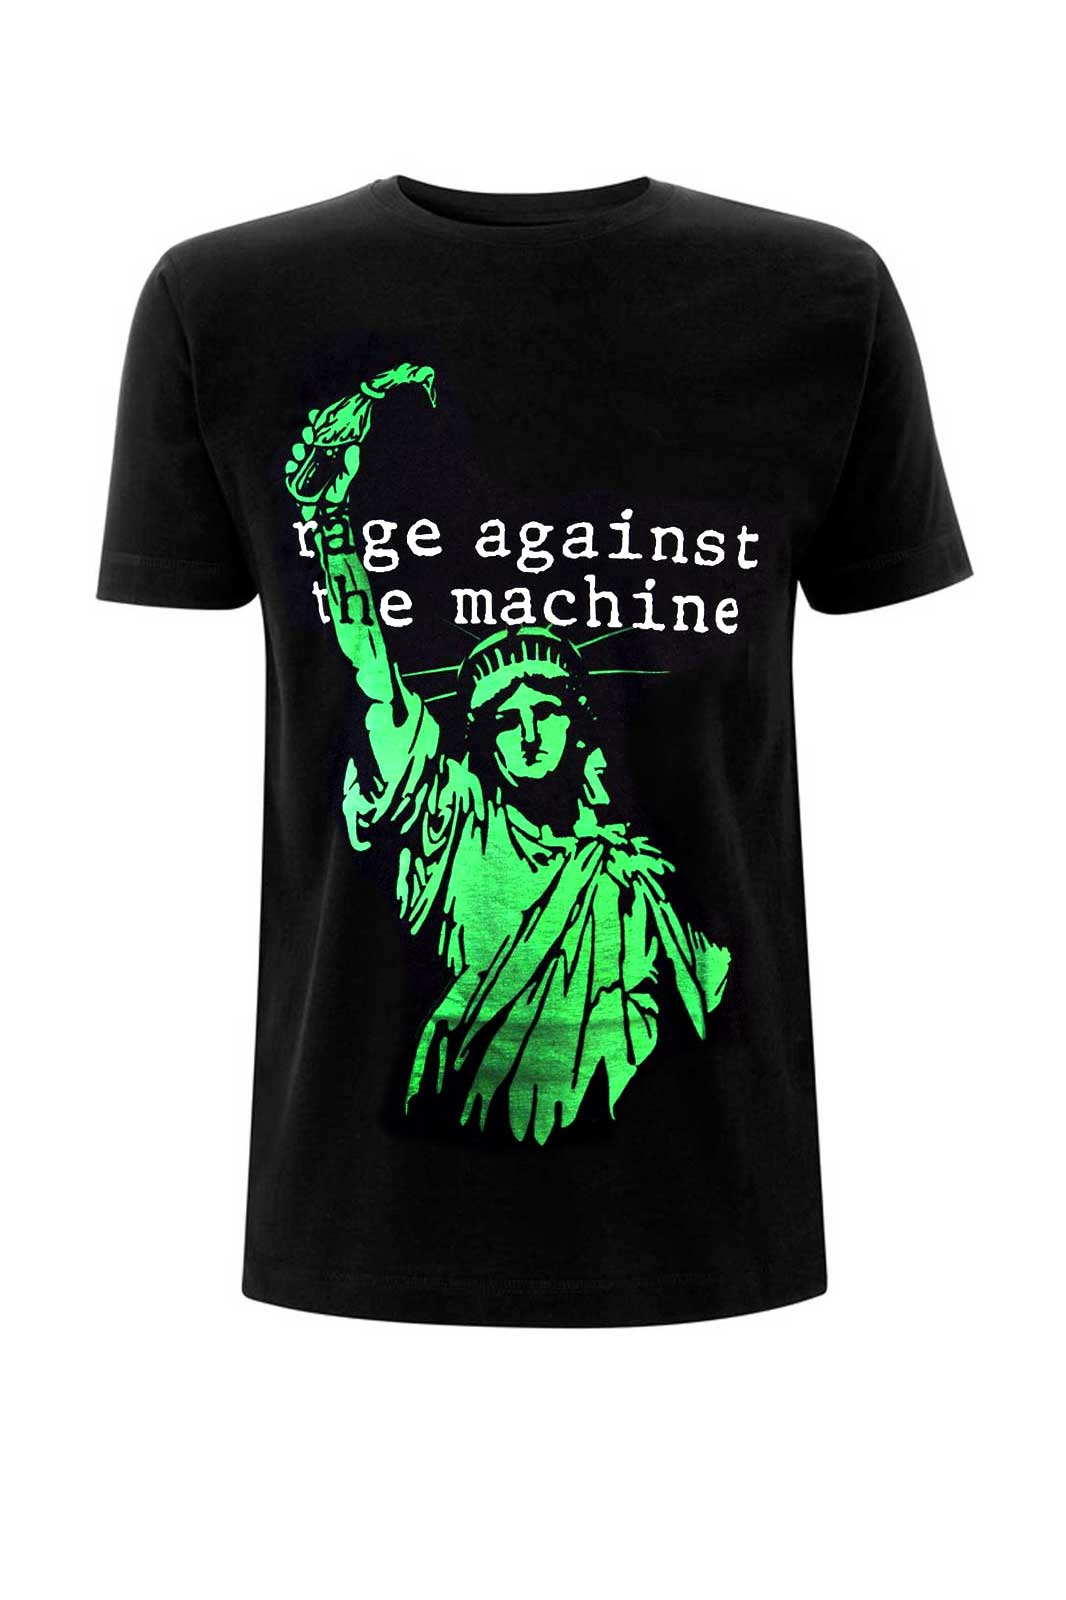 Tee Rage Against The Machine